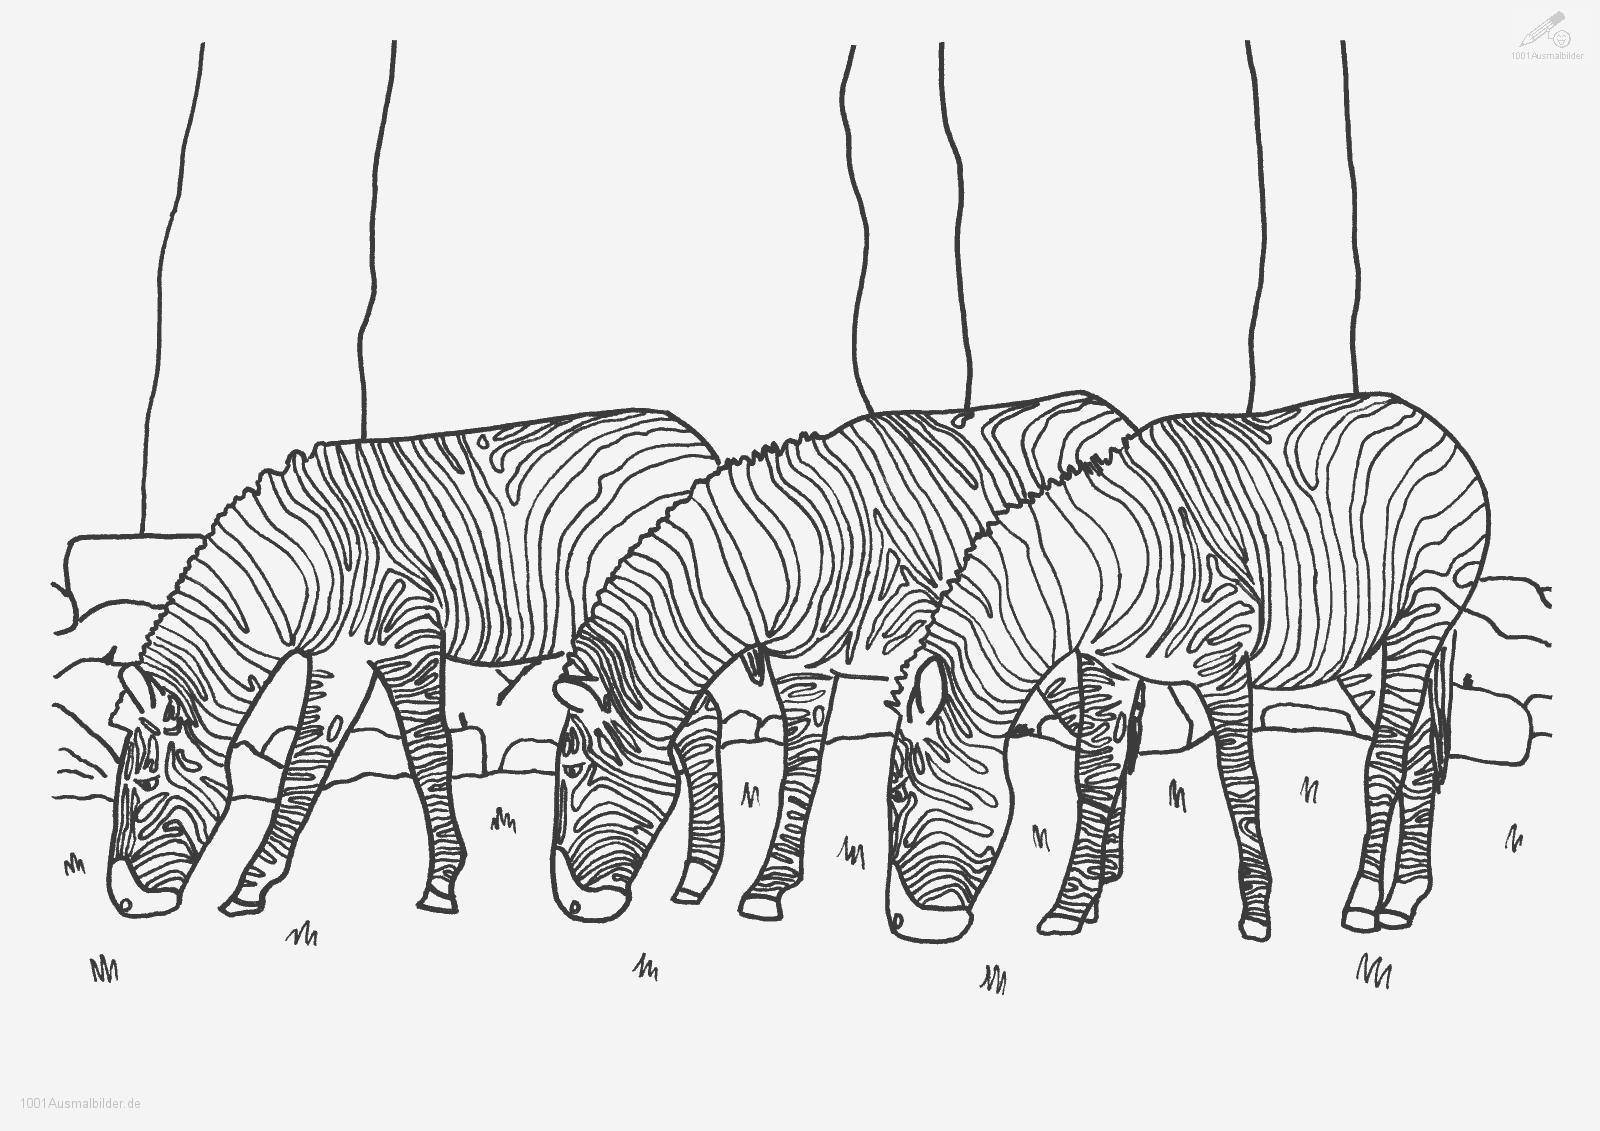 malvorlage: malvorlage-zebra-6